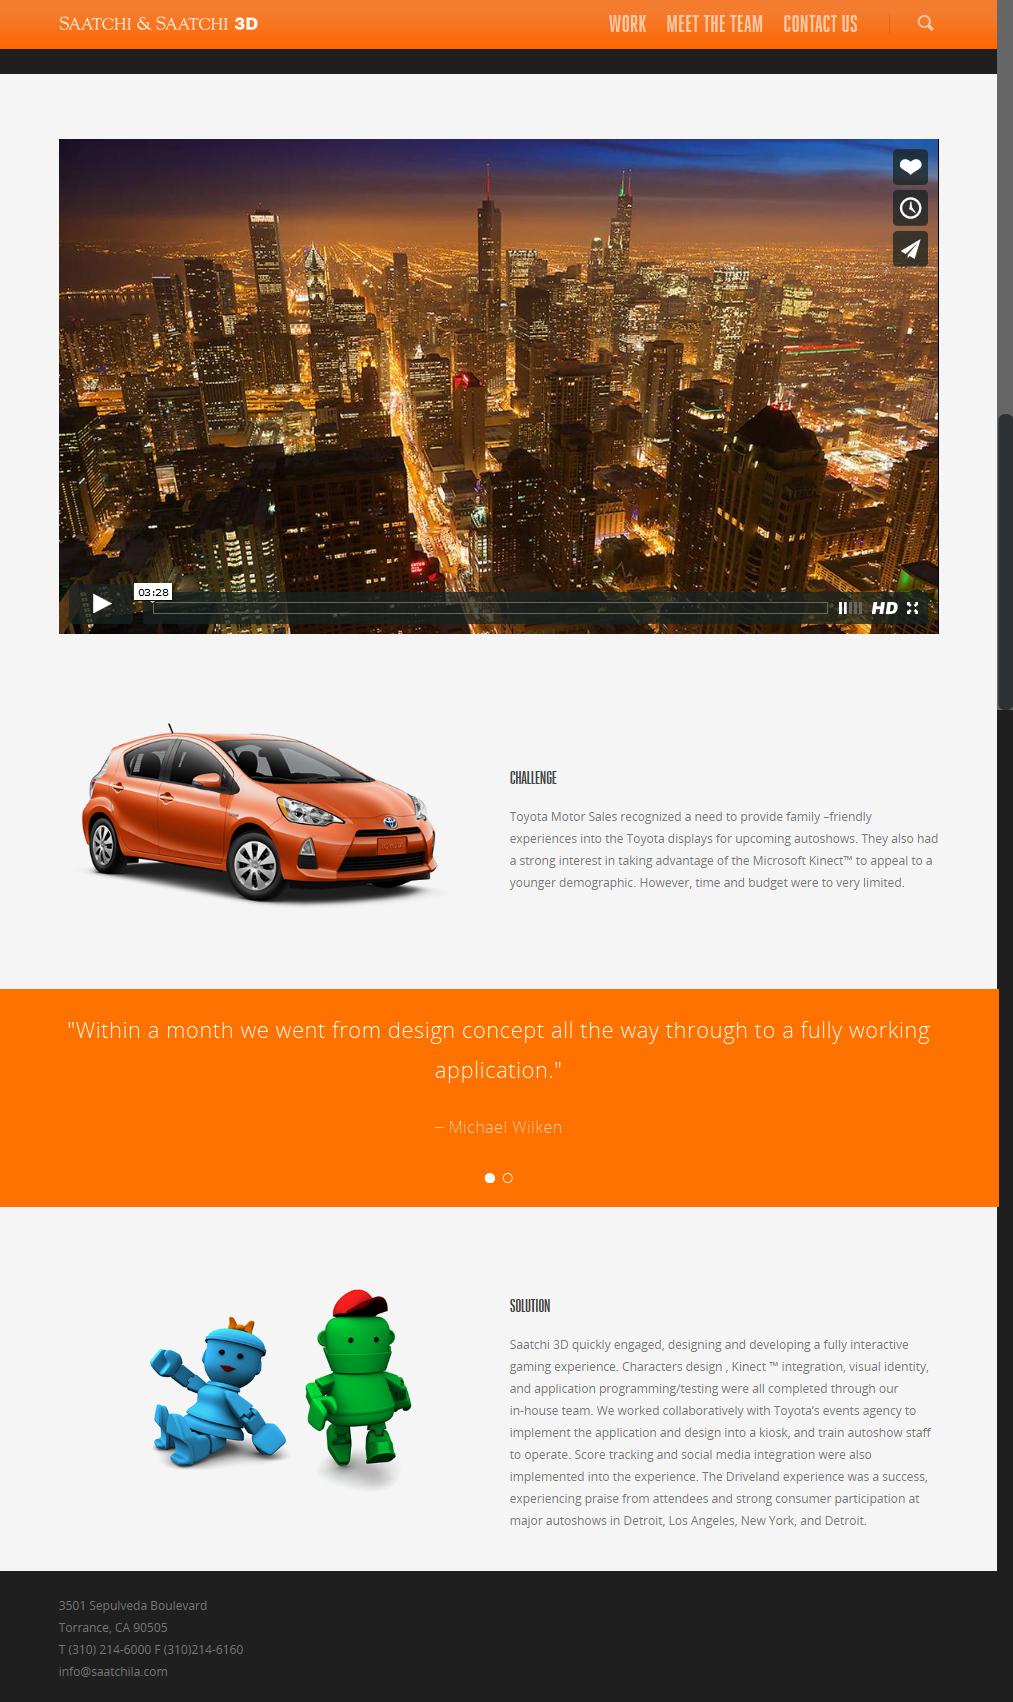 Driveland_2014-08-04_Toyota_Driveland_Experience_Saatchi_&_Saatchi_3D